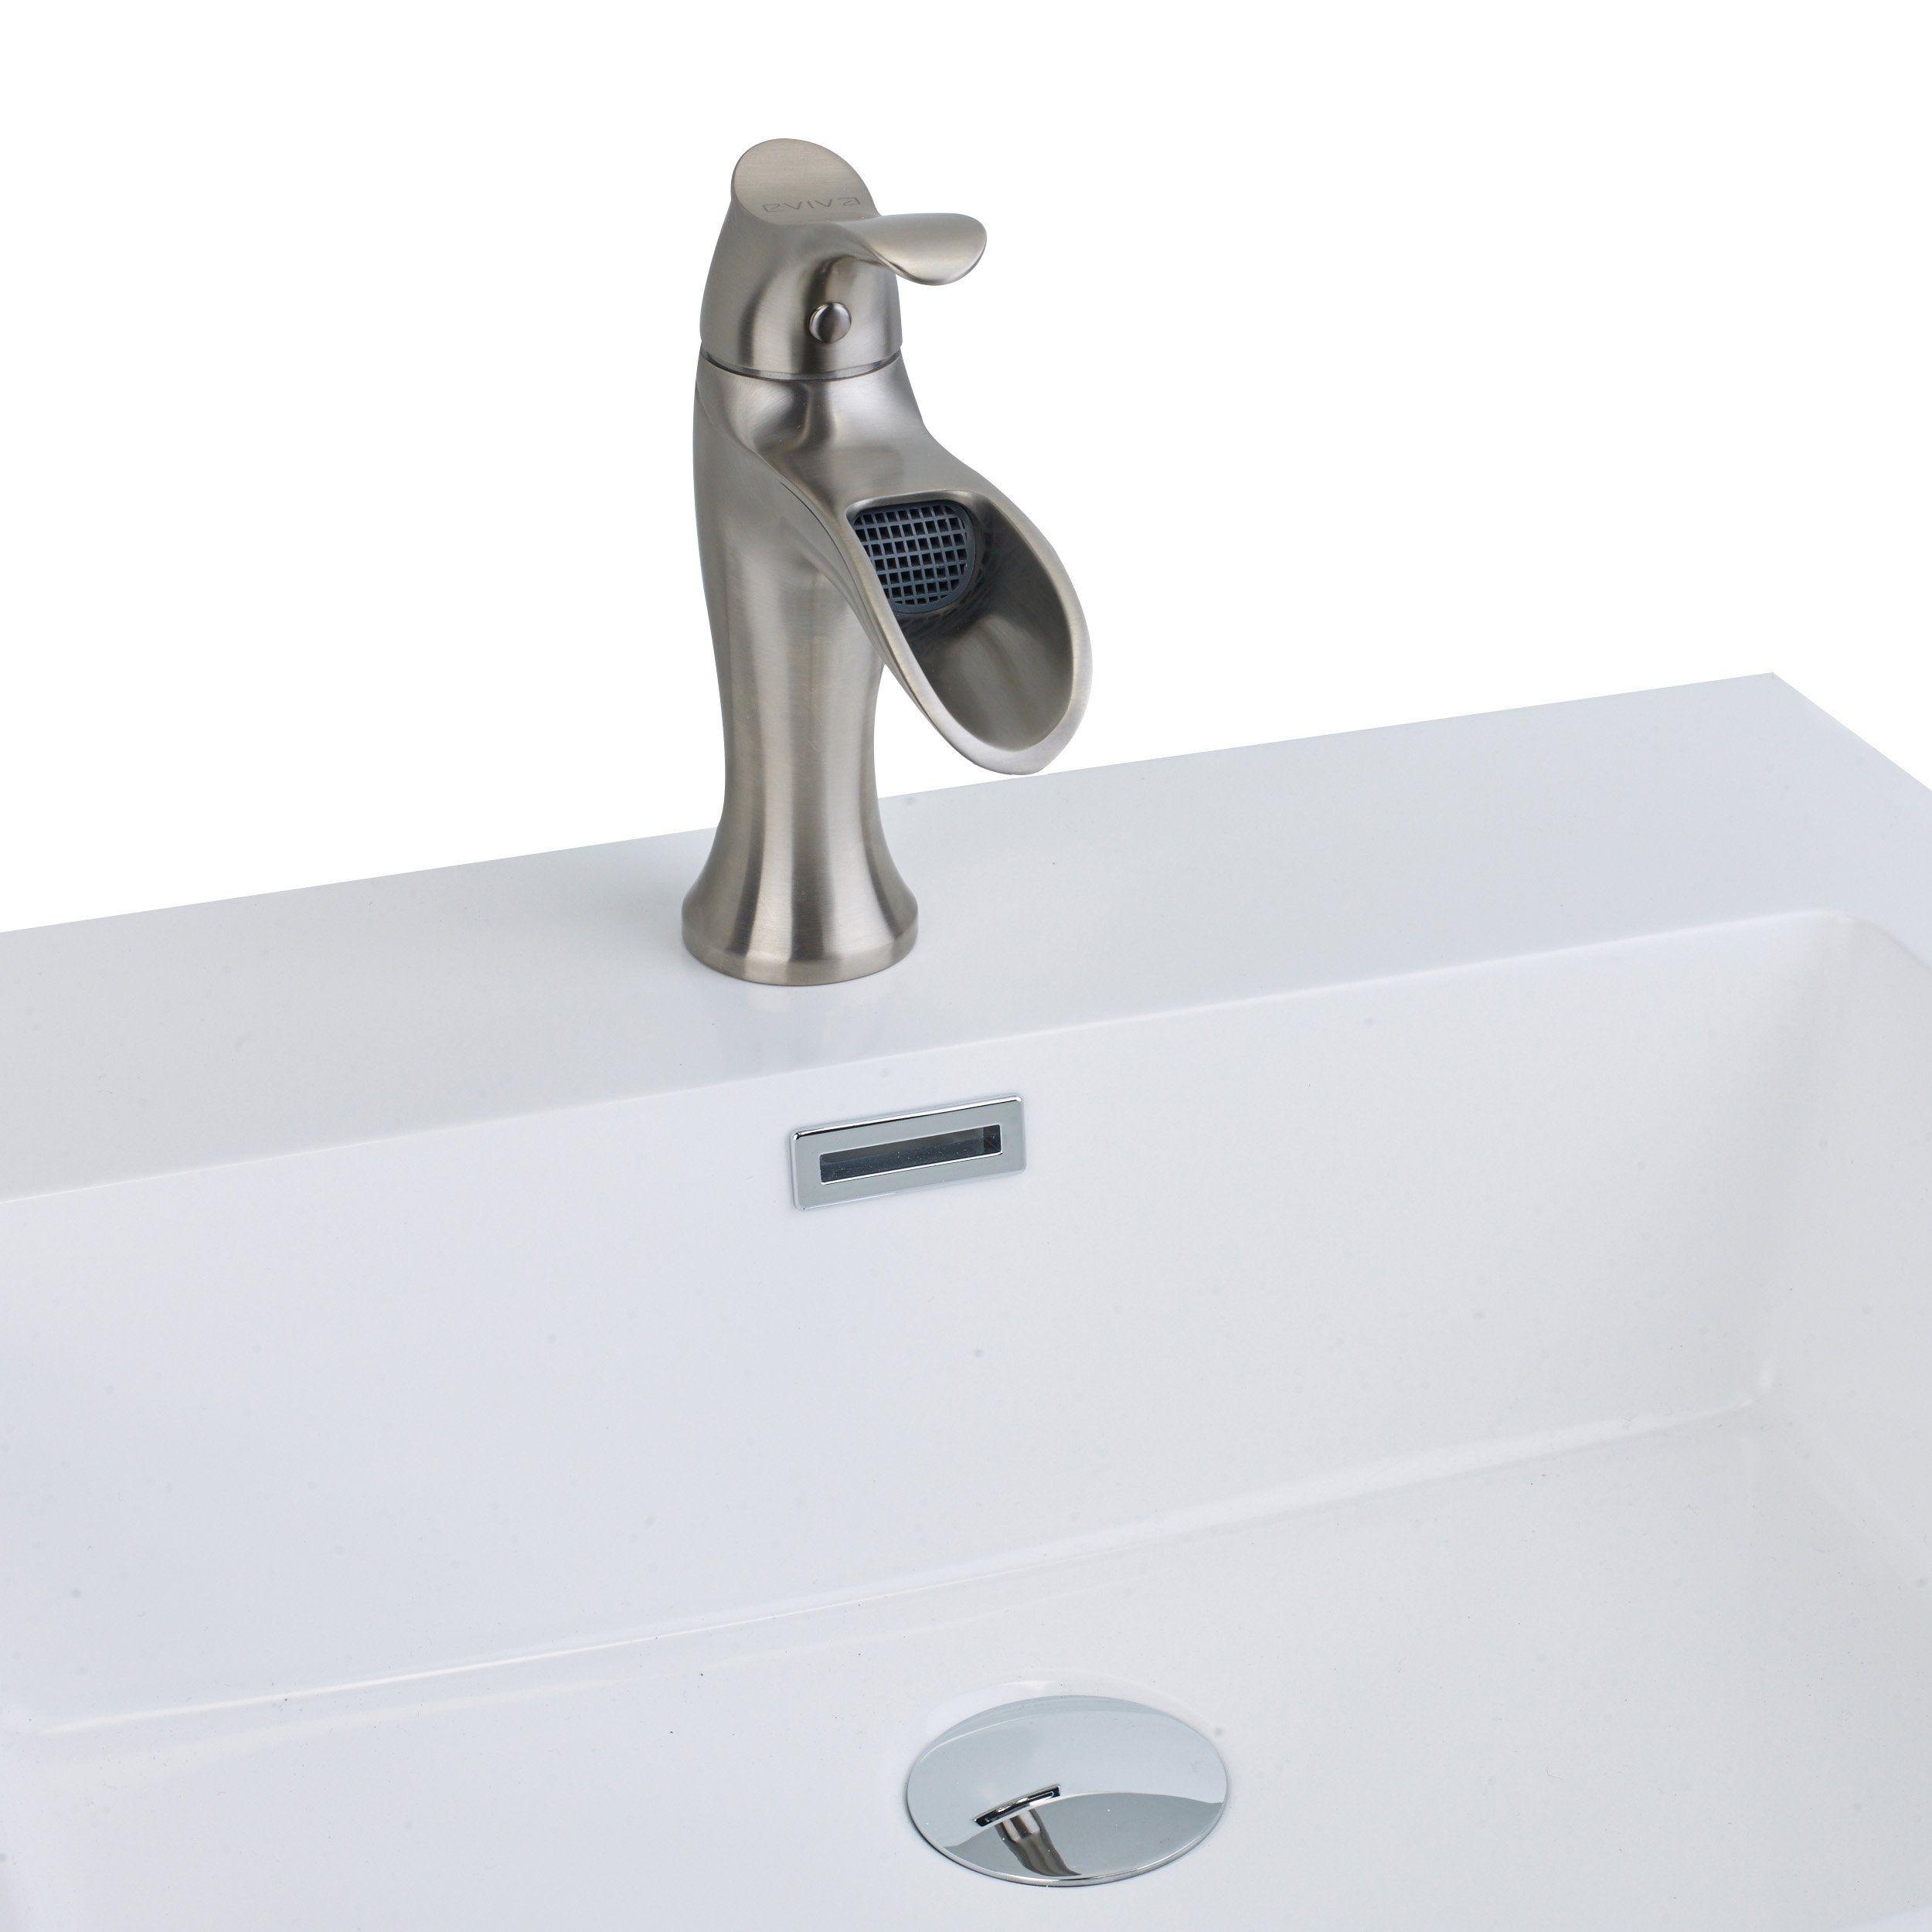 Eviva Swan Luxury Waterfall Single Handle Faucet Evft164 Sink Faucets Bathroom Sink Faucets Faucet